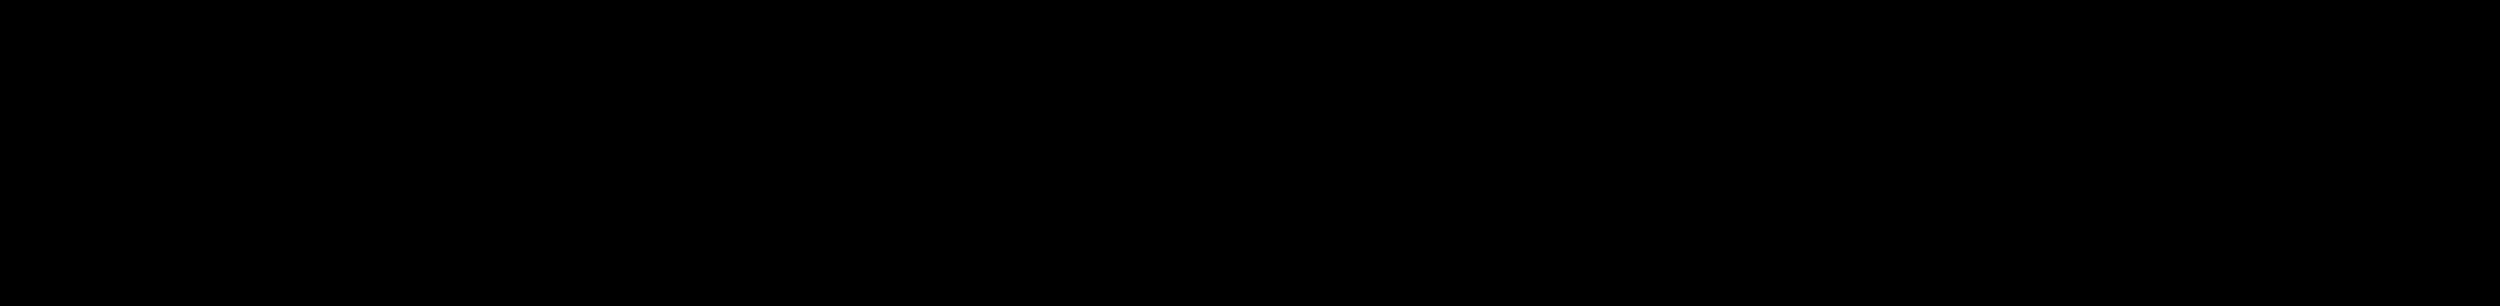 anglepoise-logo-black.png